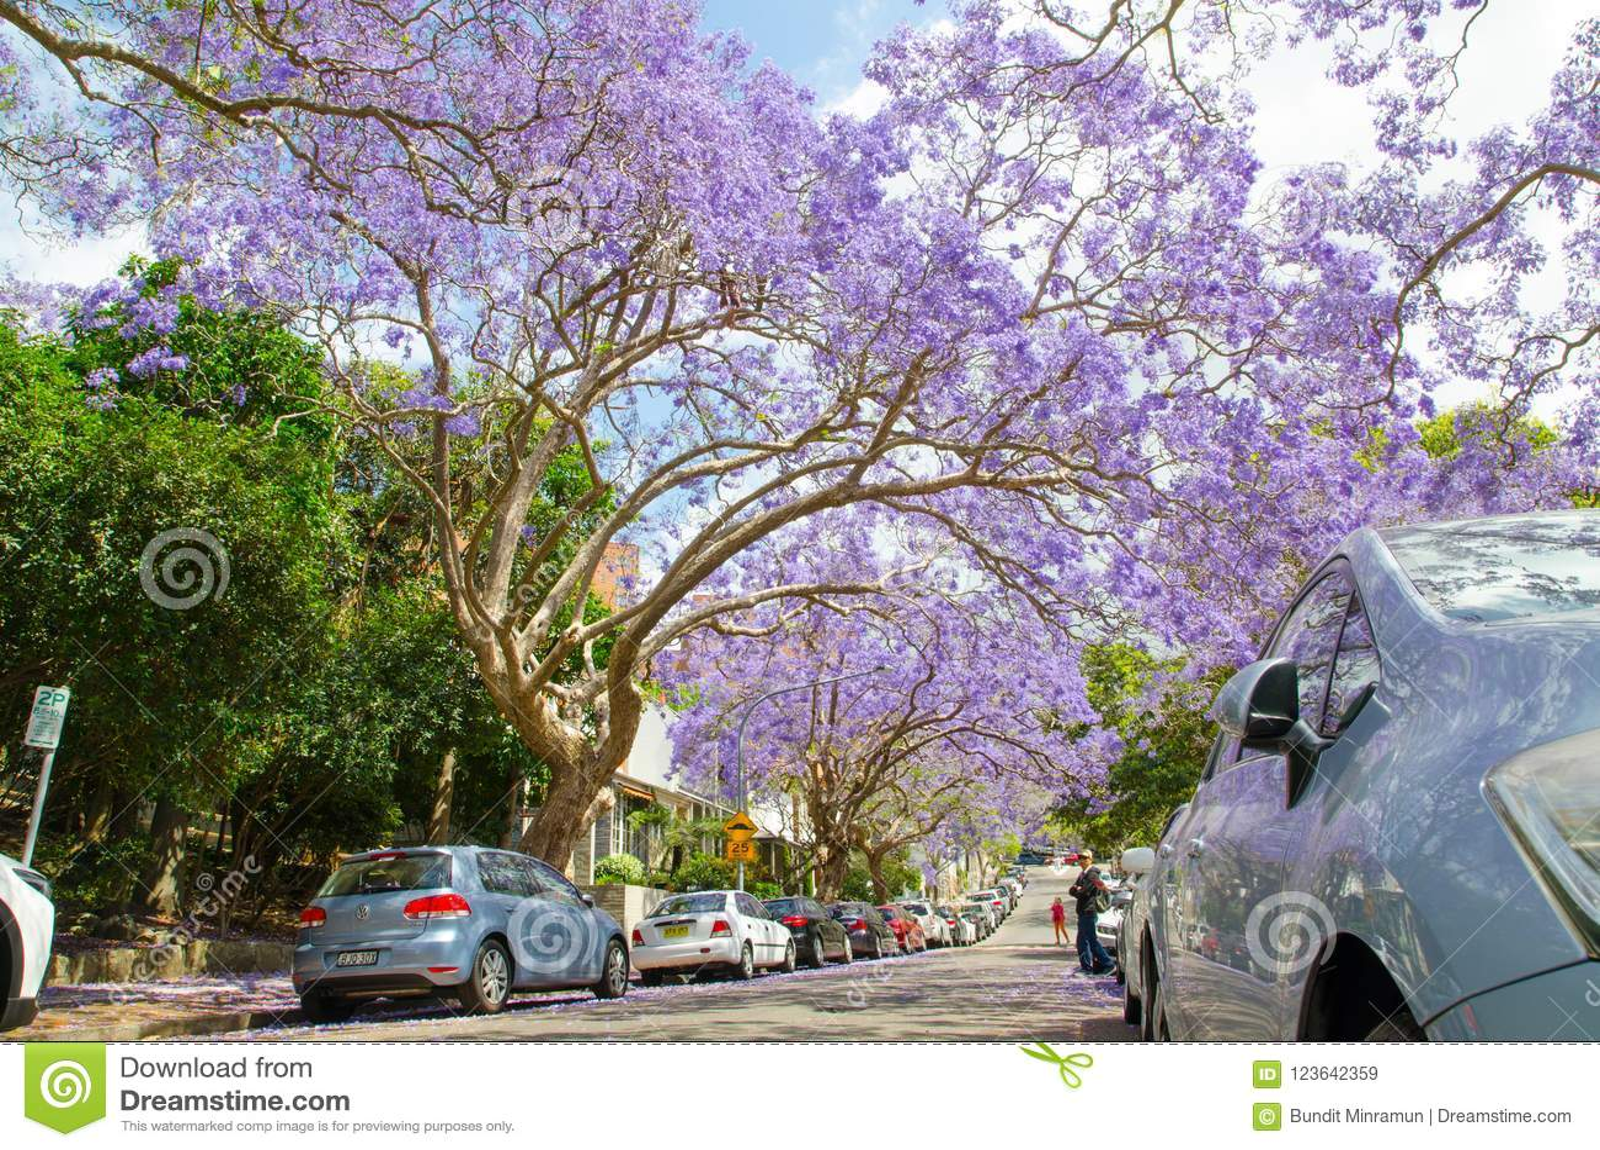 Flowering Purple Flowers Jacaranda Trees In Mcdougall St Kirribilli